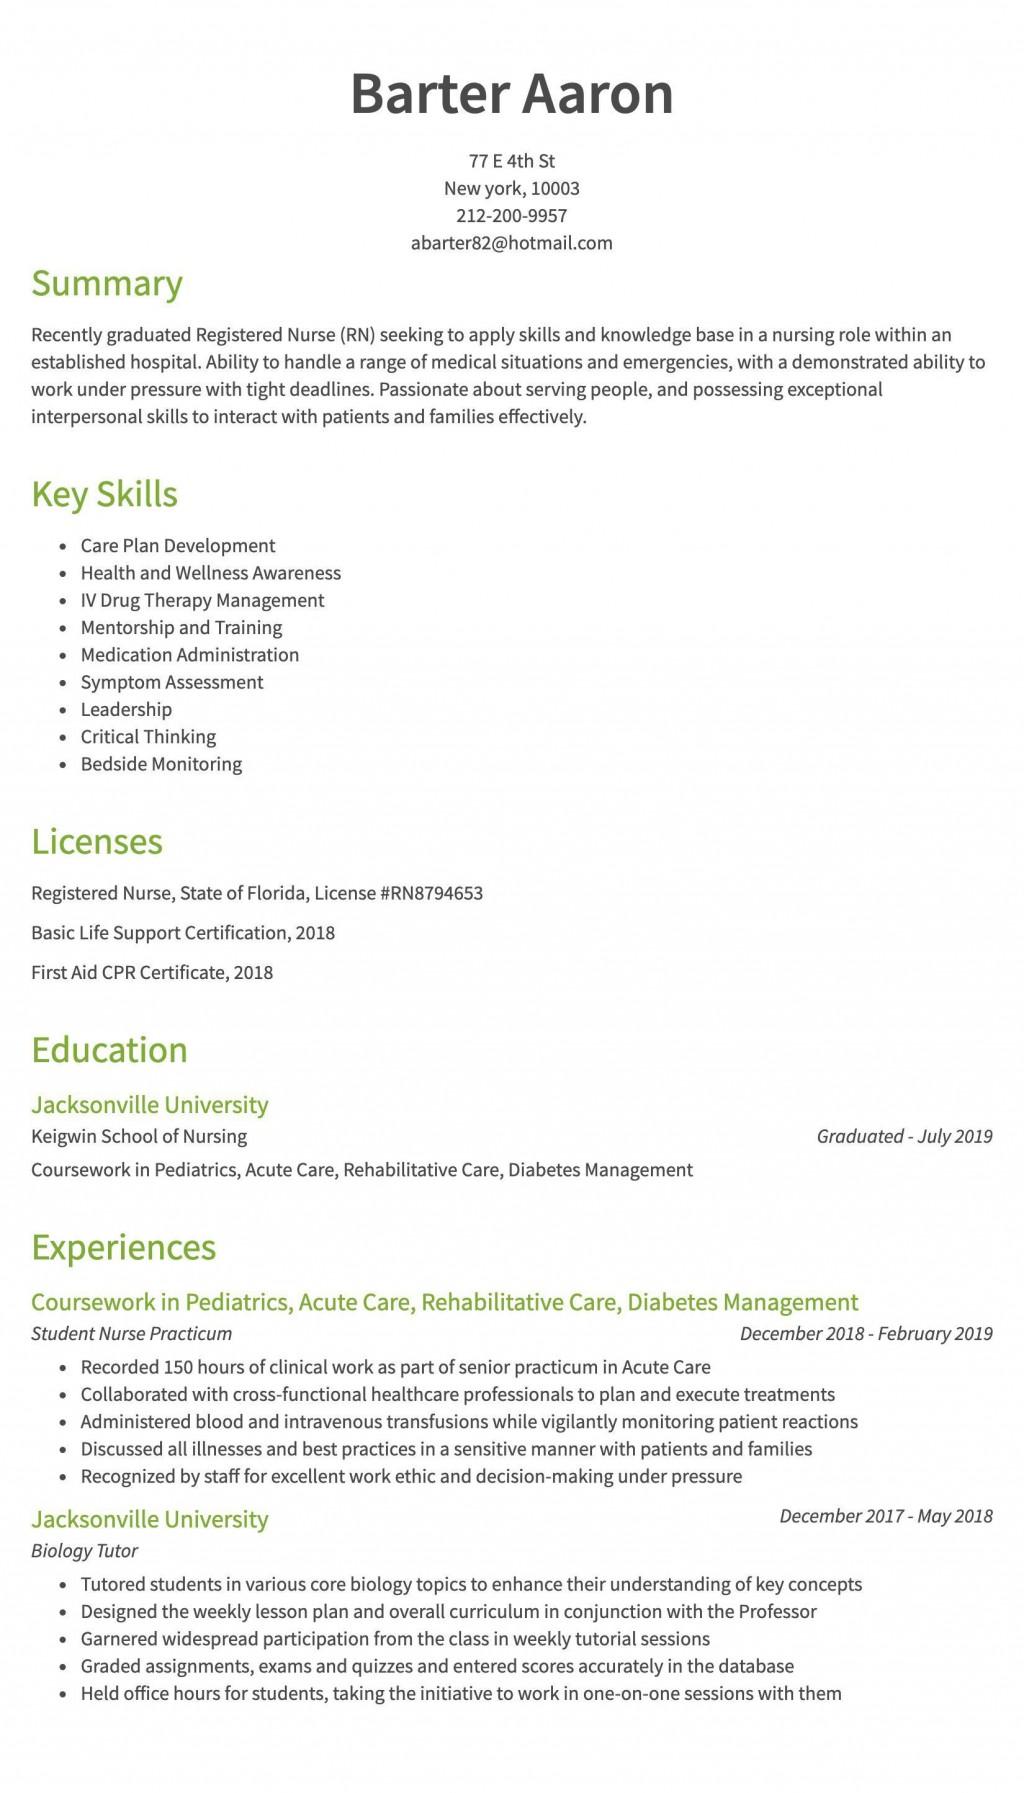 008 Remarkable Rn Graduate Resume Template High Resolution  New Nurse PractitionerLarge